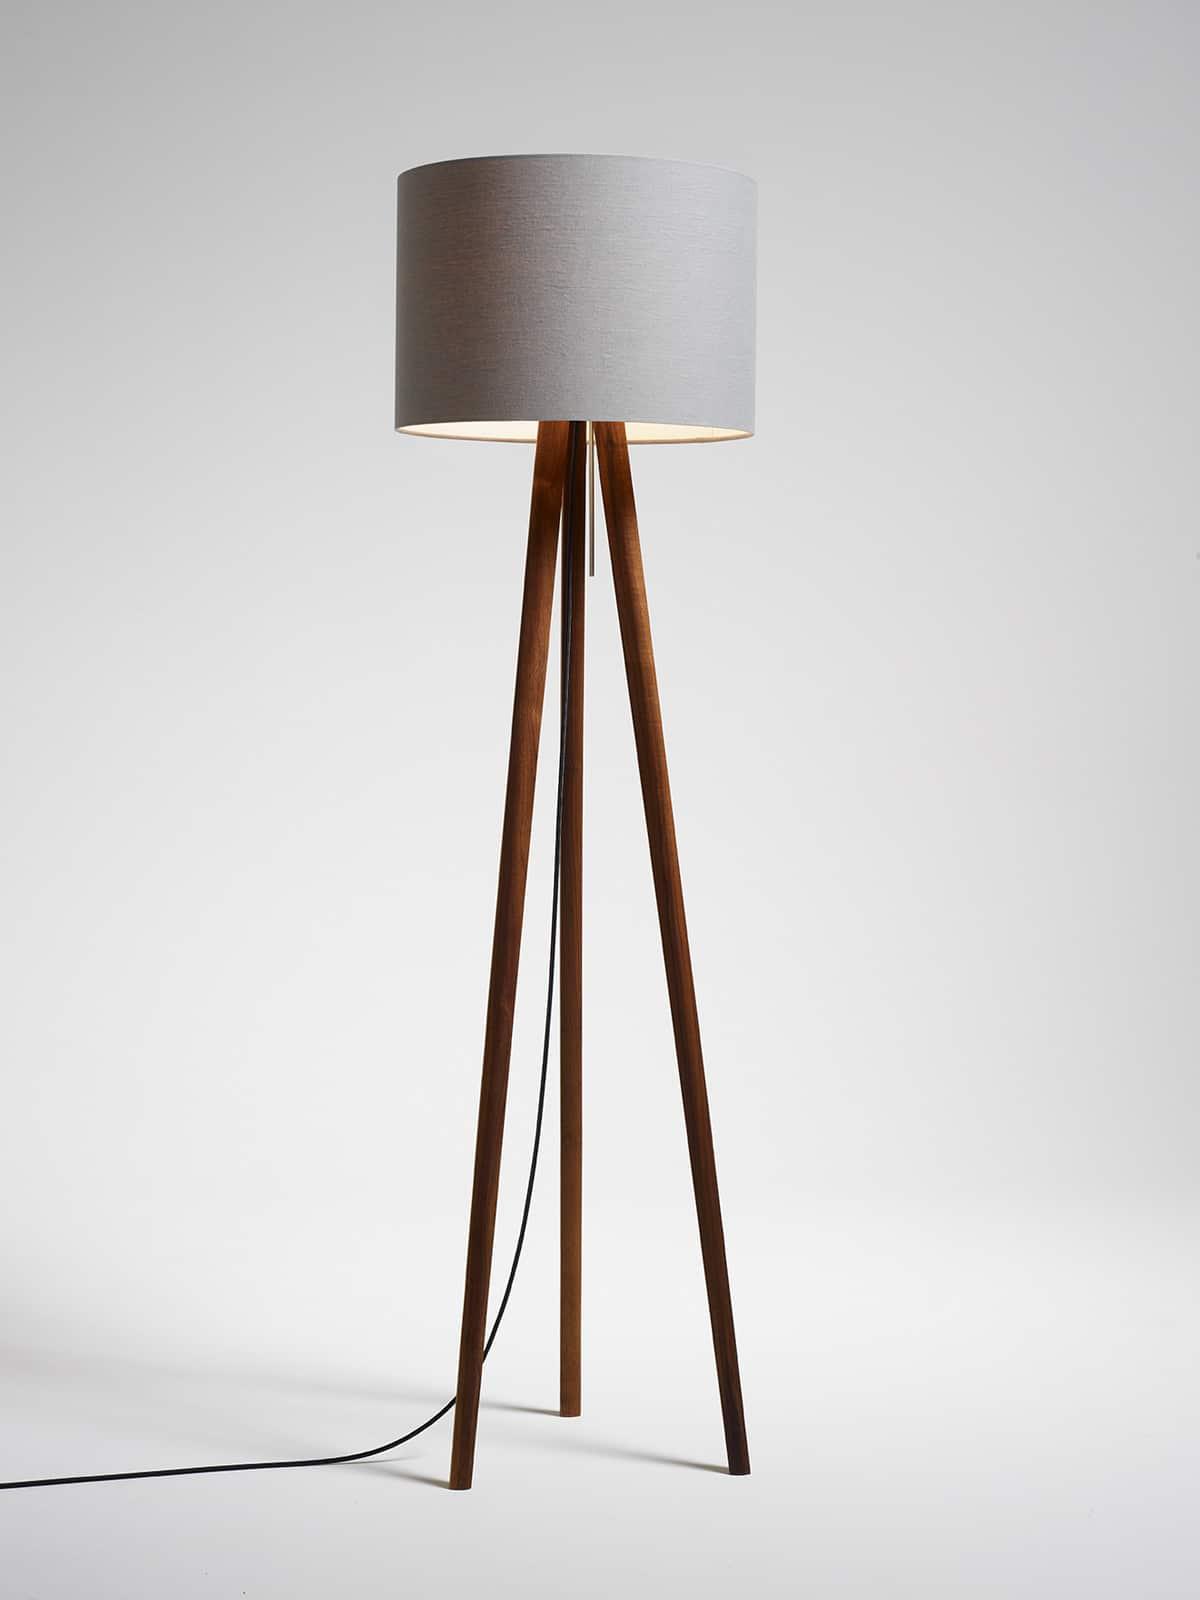 sten cloud lampen leuchten designerleuchten online. Black Bedroom Furniture Sets. Home Design Ideas